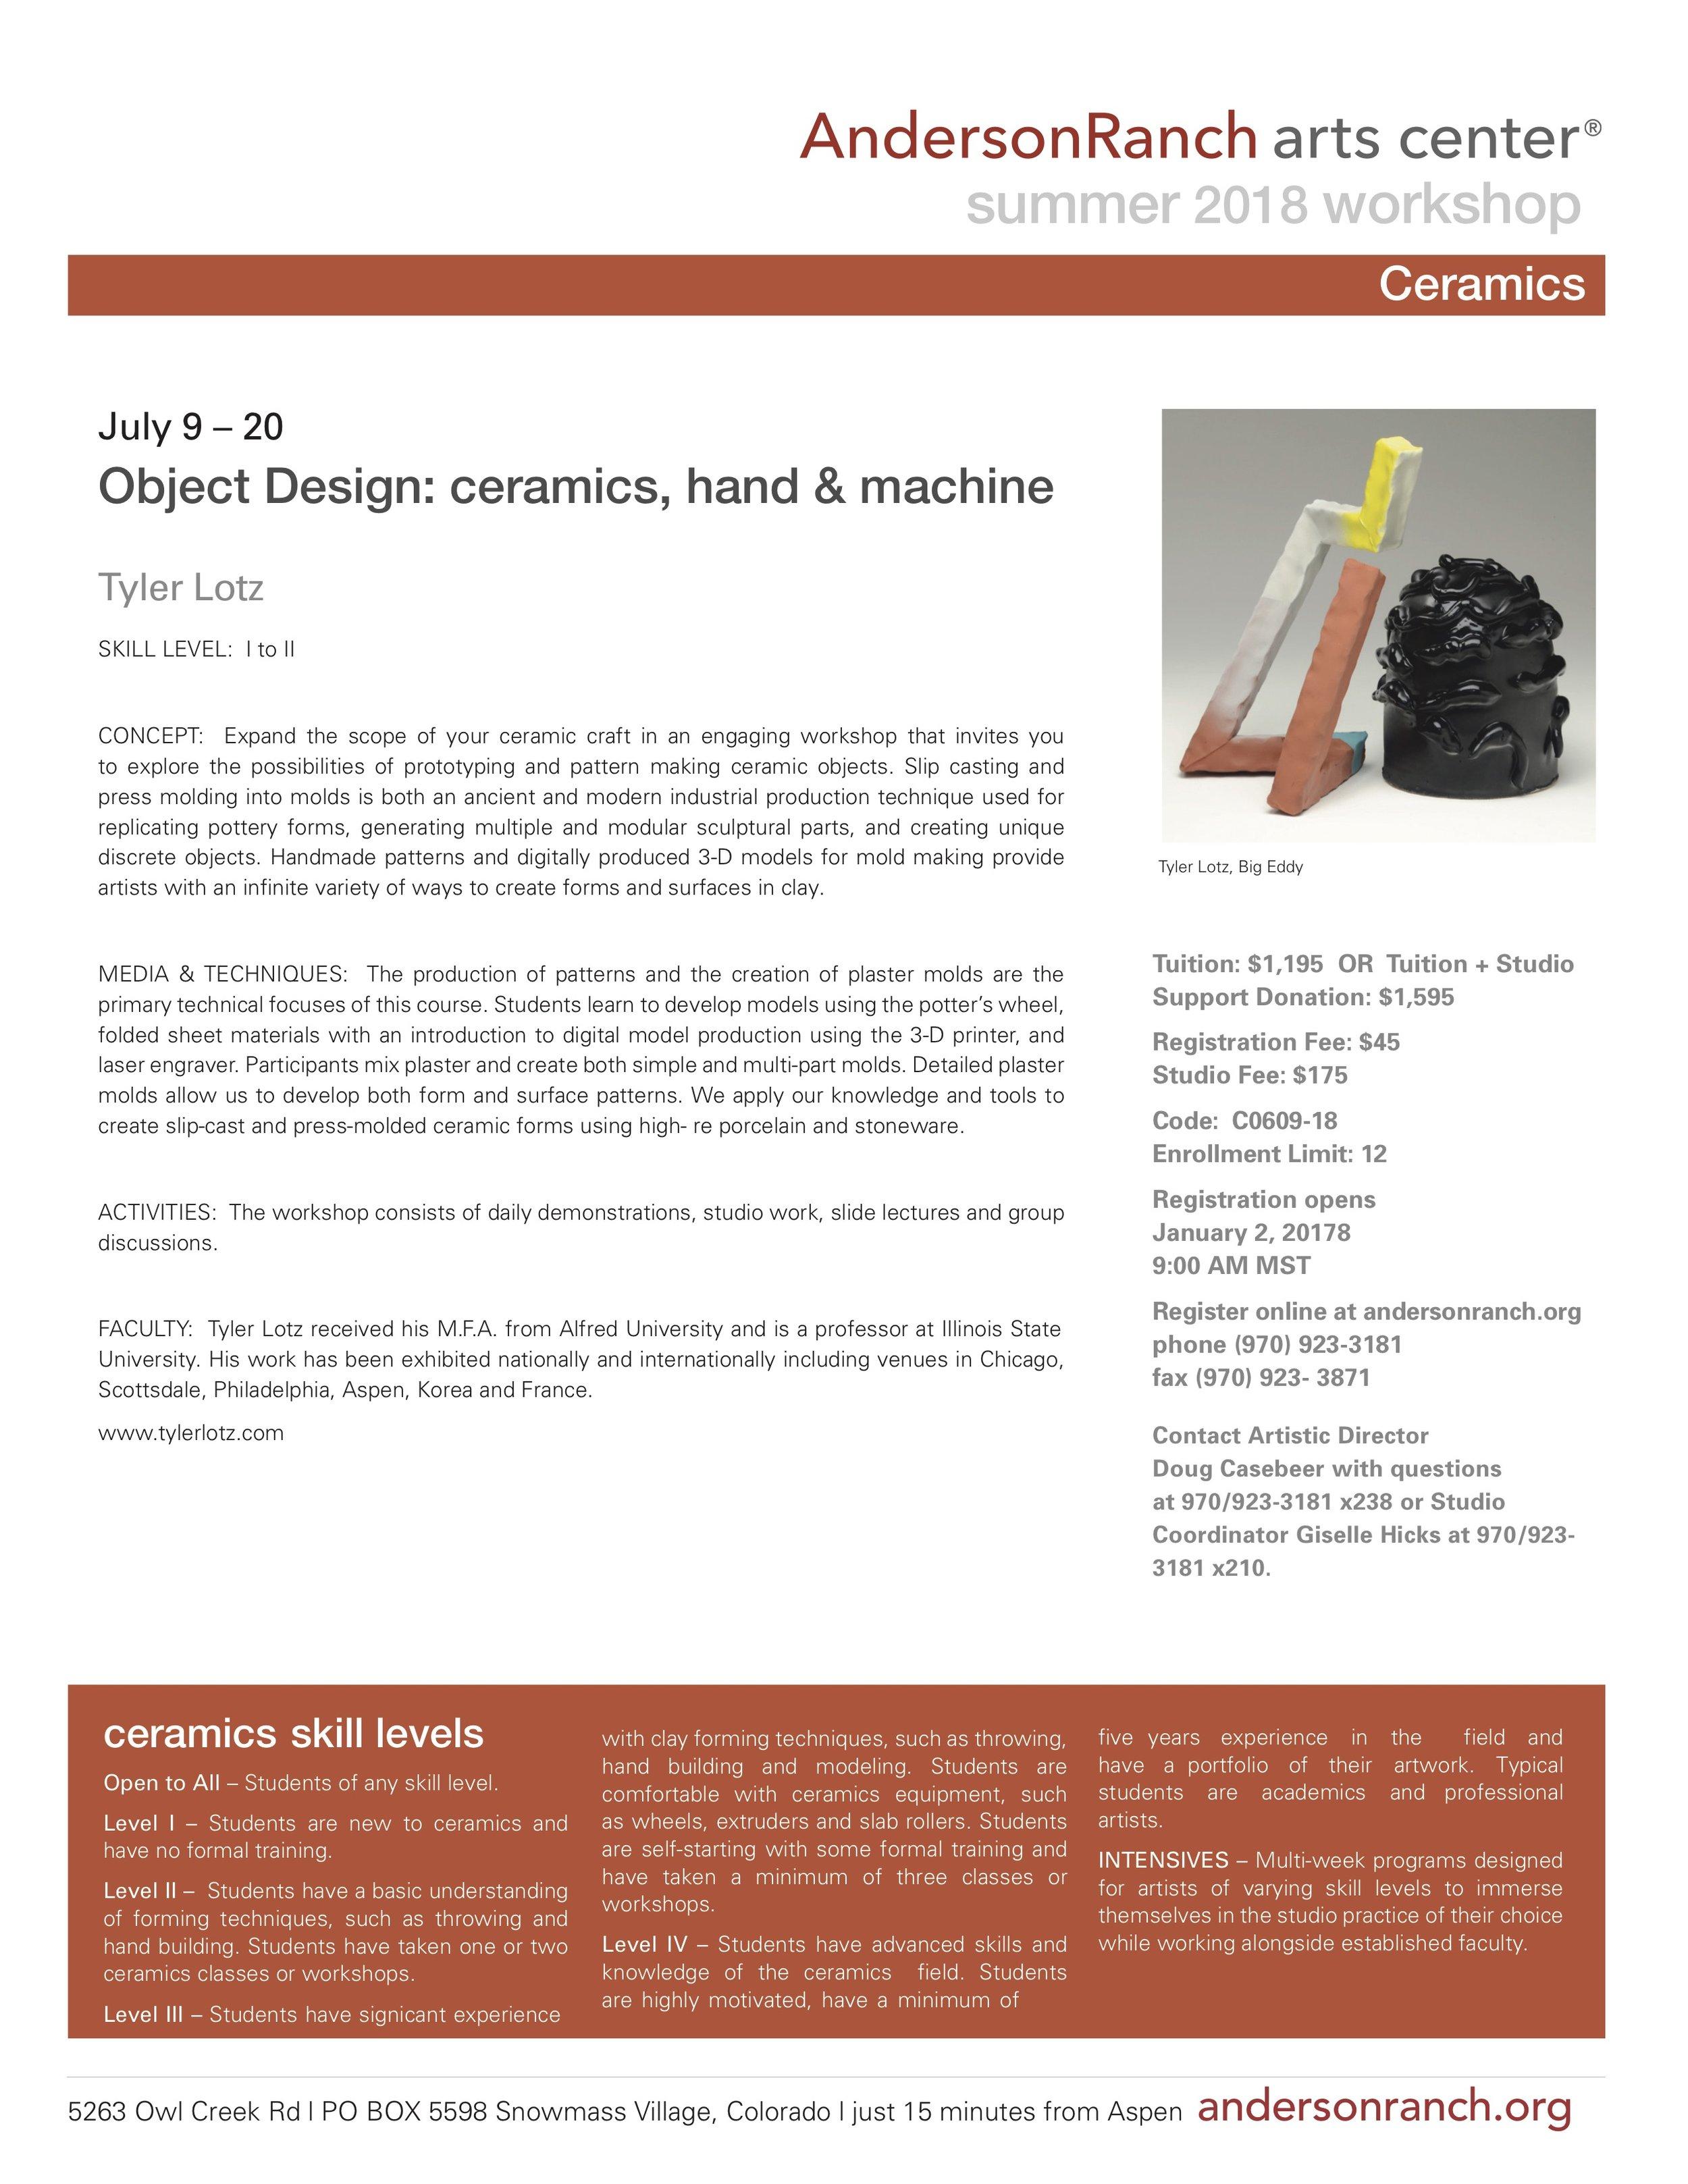 Object Design ceramics hand and machine.jpeg